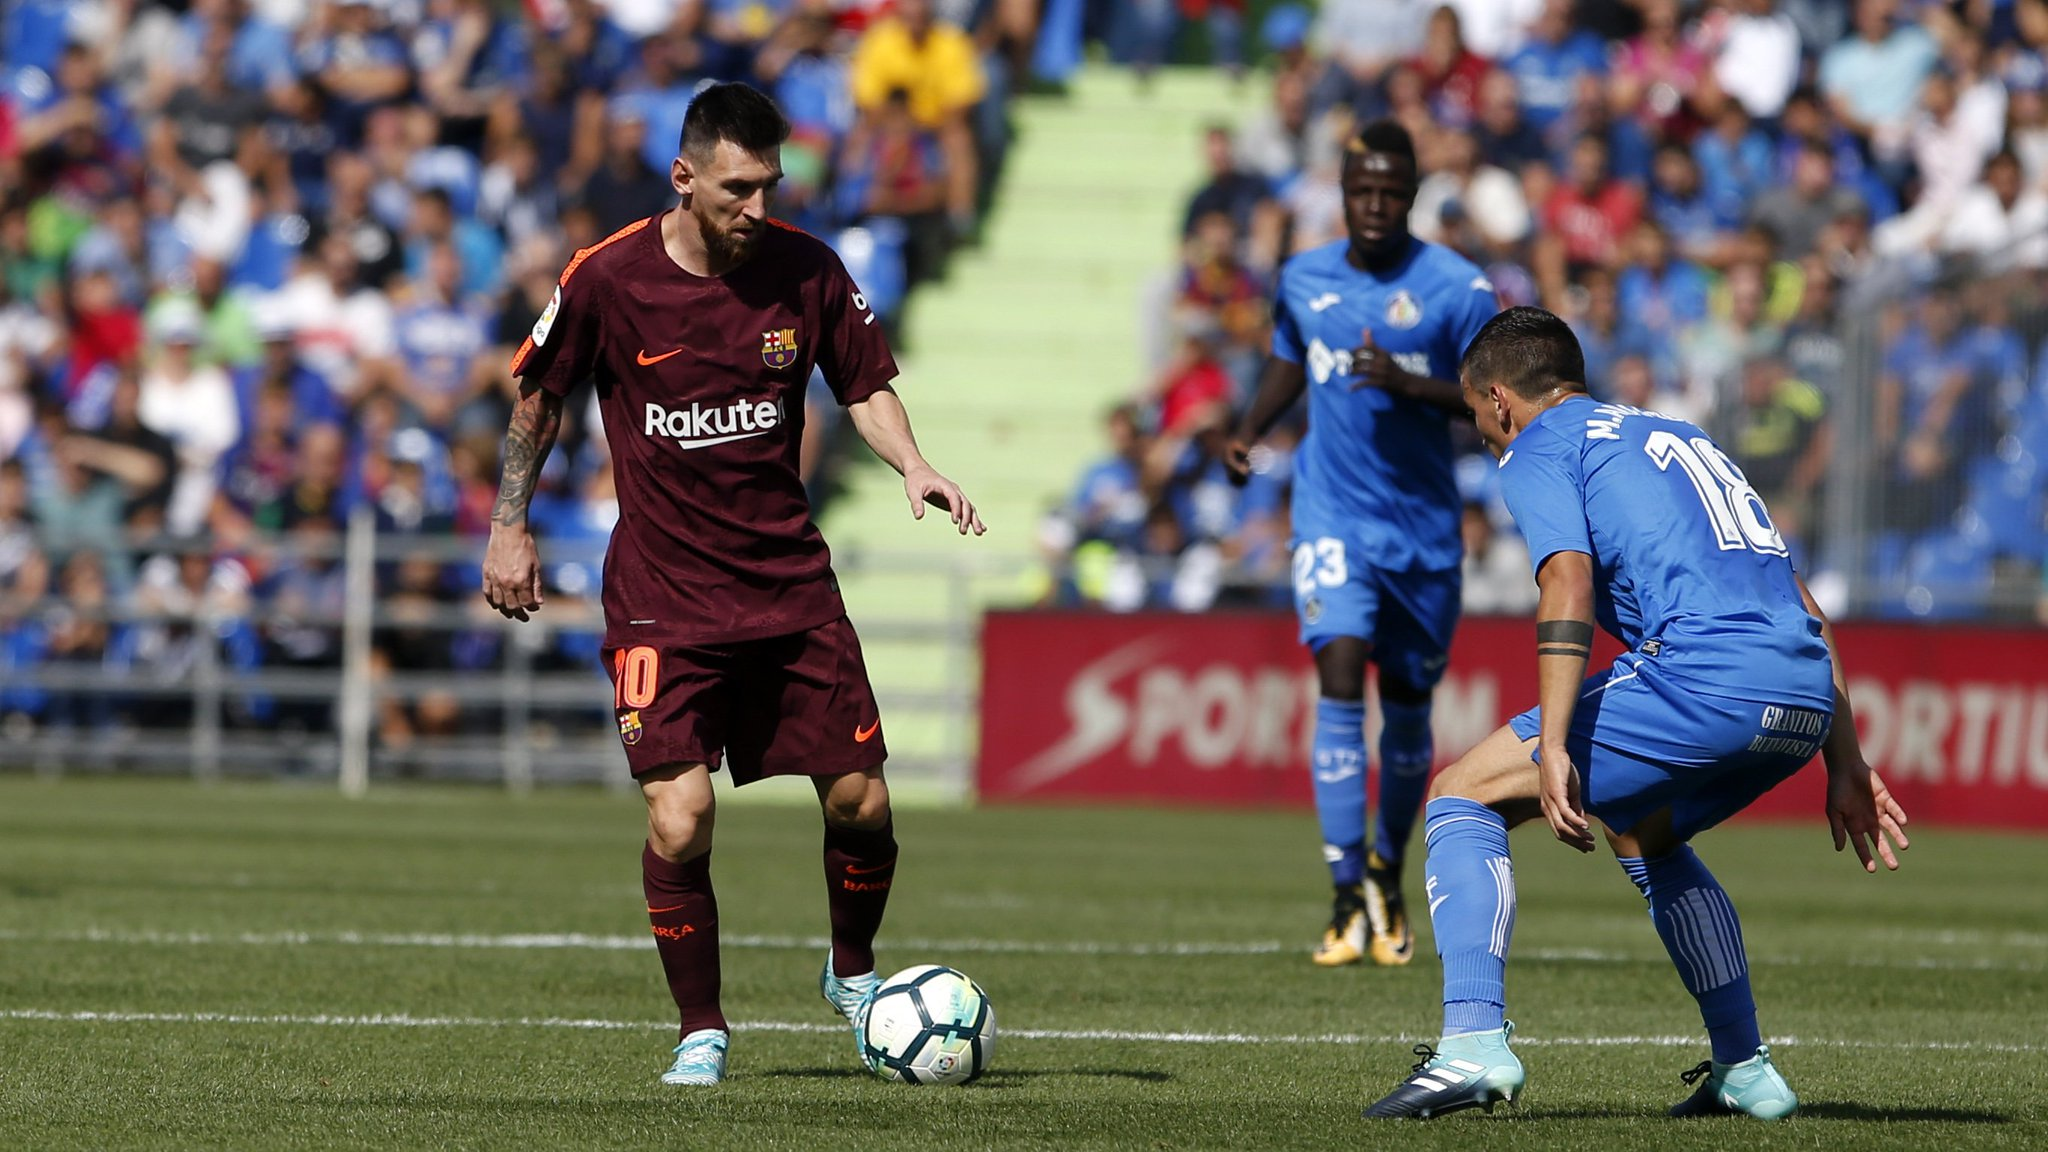 ゚モニ [KICK OFF TIME CONFIRMED] ゚モヘ Week 23 ¬レᄑᄌマ #BarᅢᄃaGetafe  ゚マᅠ Camp Nou ¬フレᄌマ Sunday 11/02 - 4.15pm CET ゚ヤᄉ゚ヤᄡ #ForᅢᄃaBarᅢᄃa https://t.co/yNGNgHAlYz